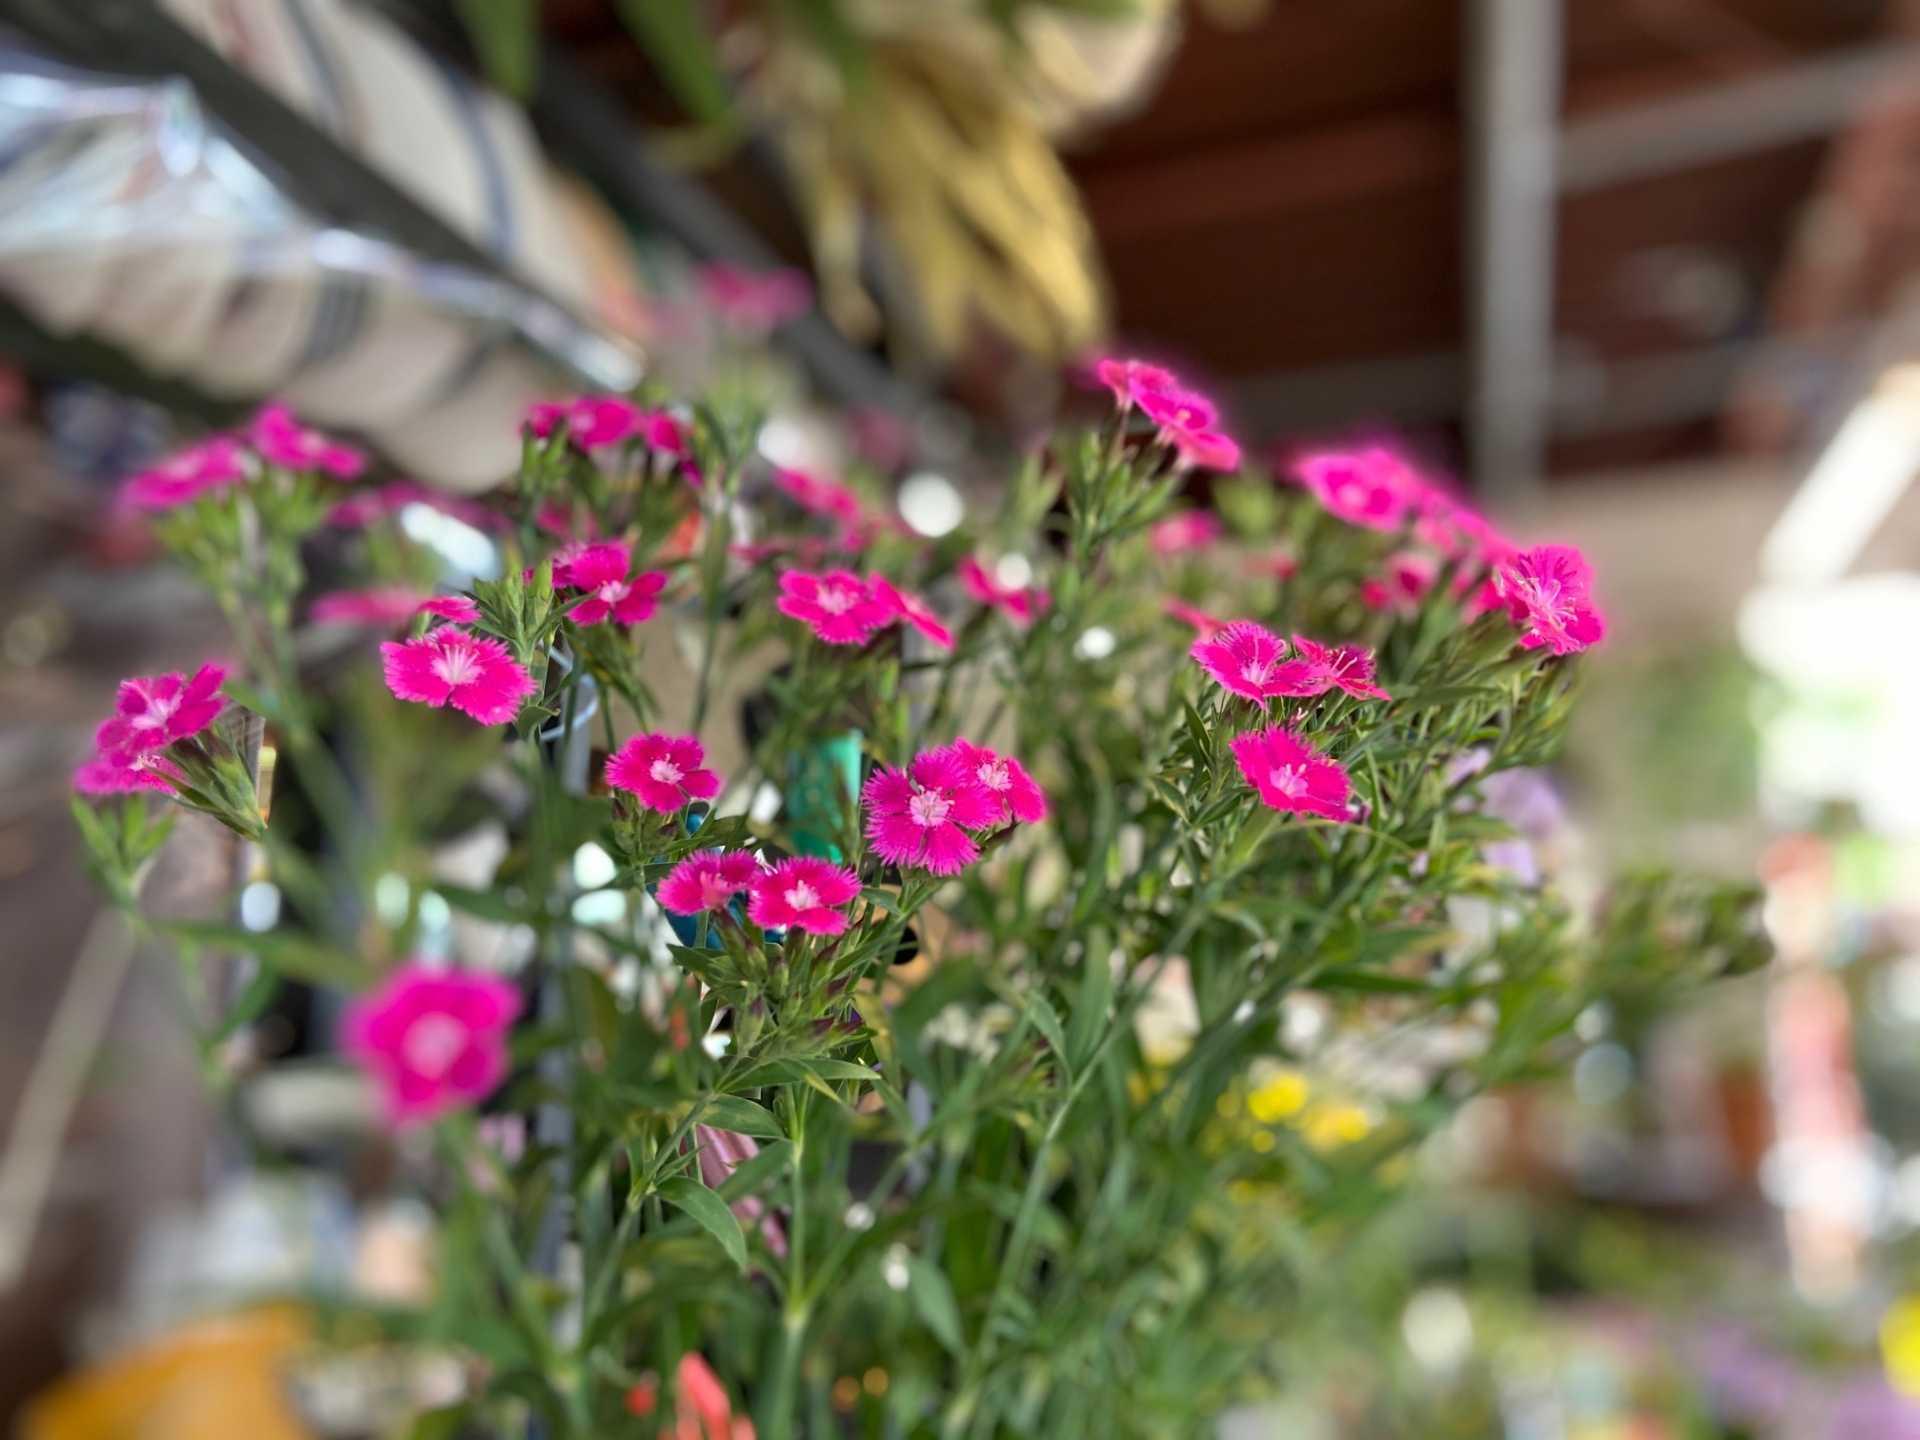 5月15日-5月17日 Weekend Flower